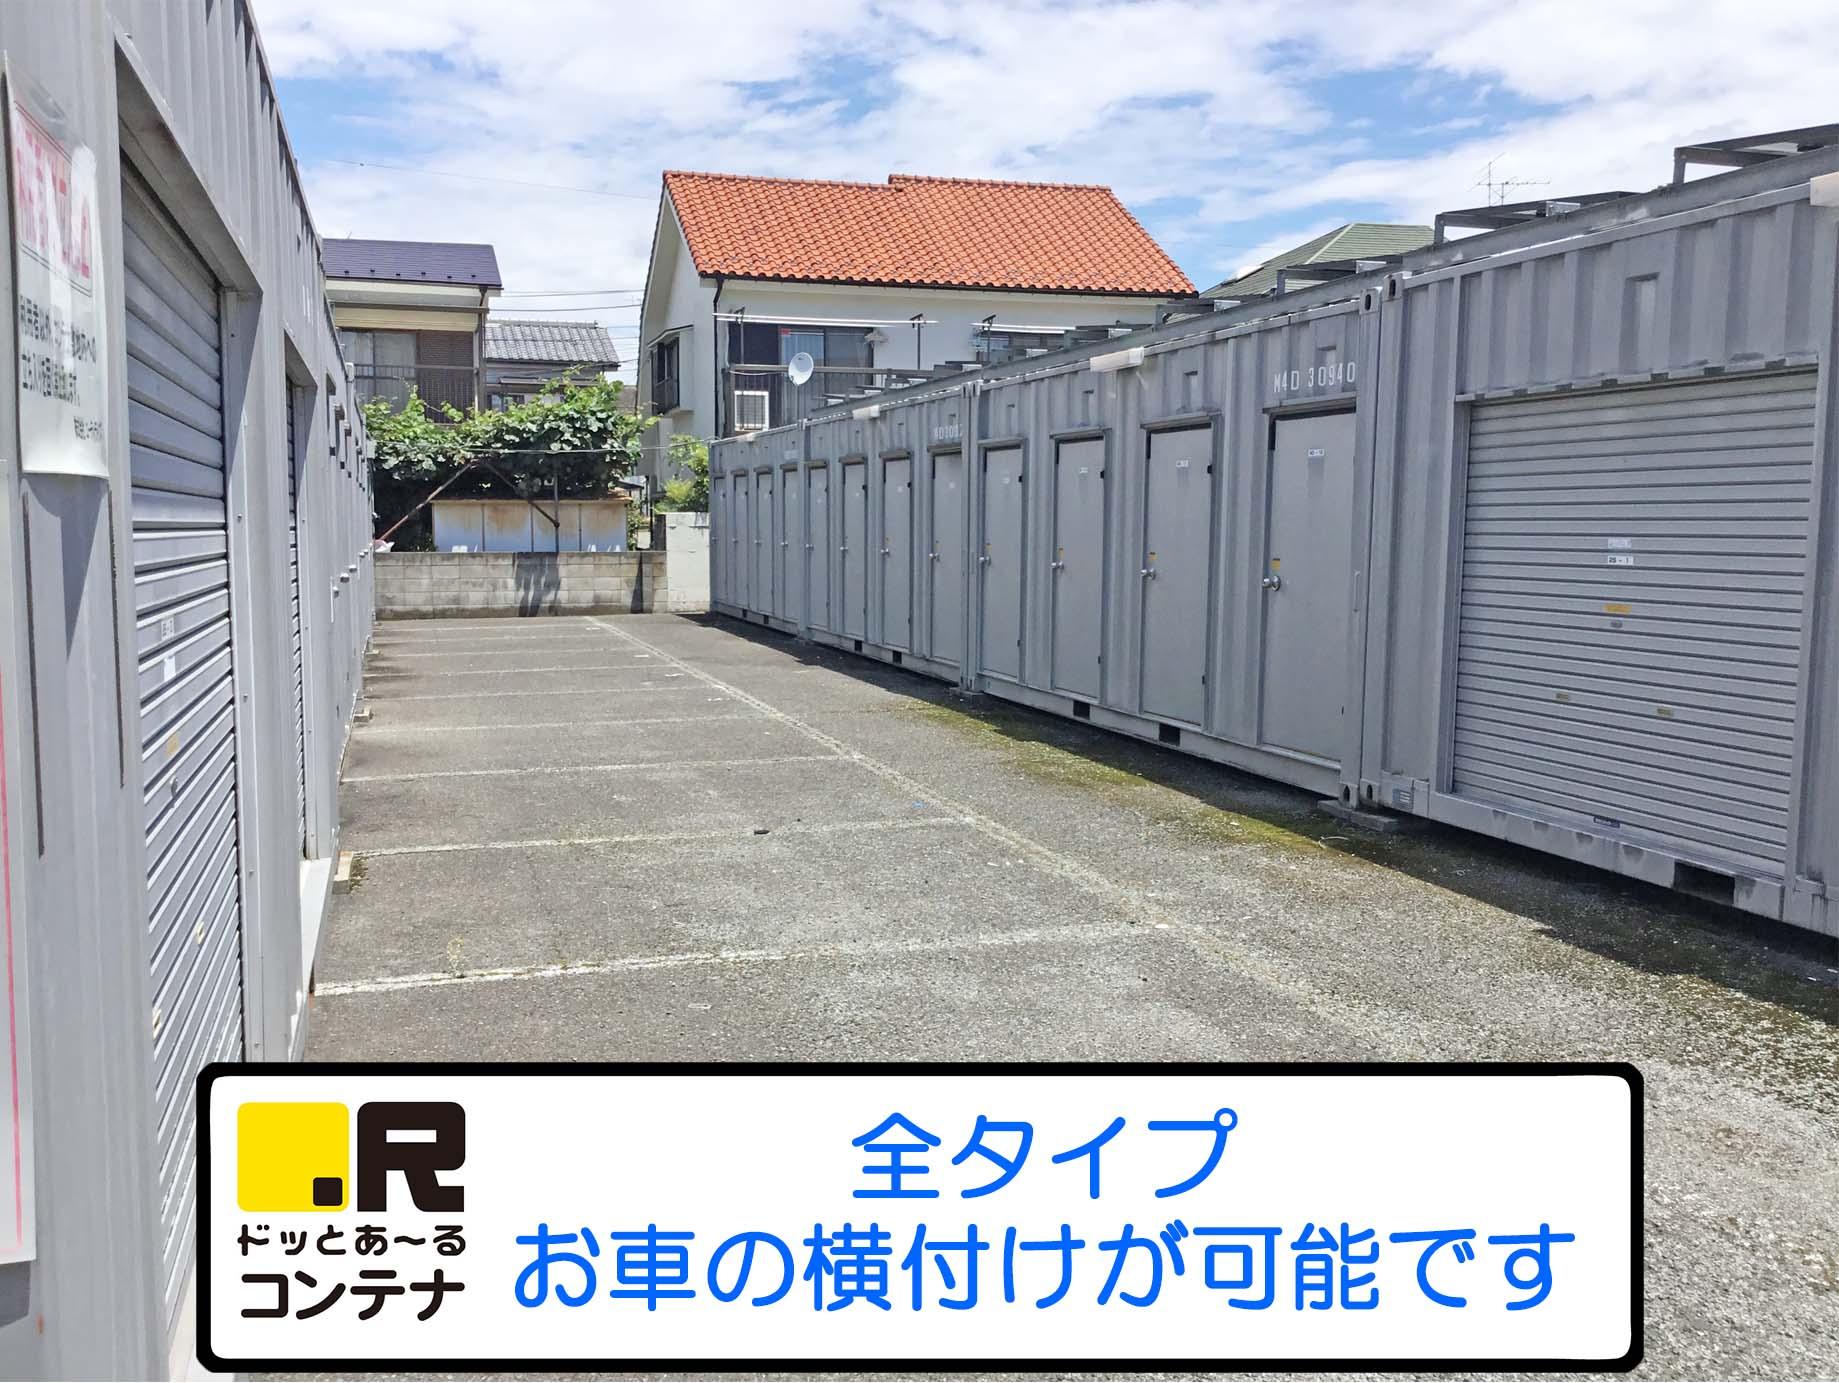 鈴木町3号外観4